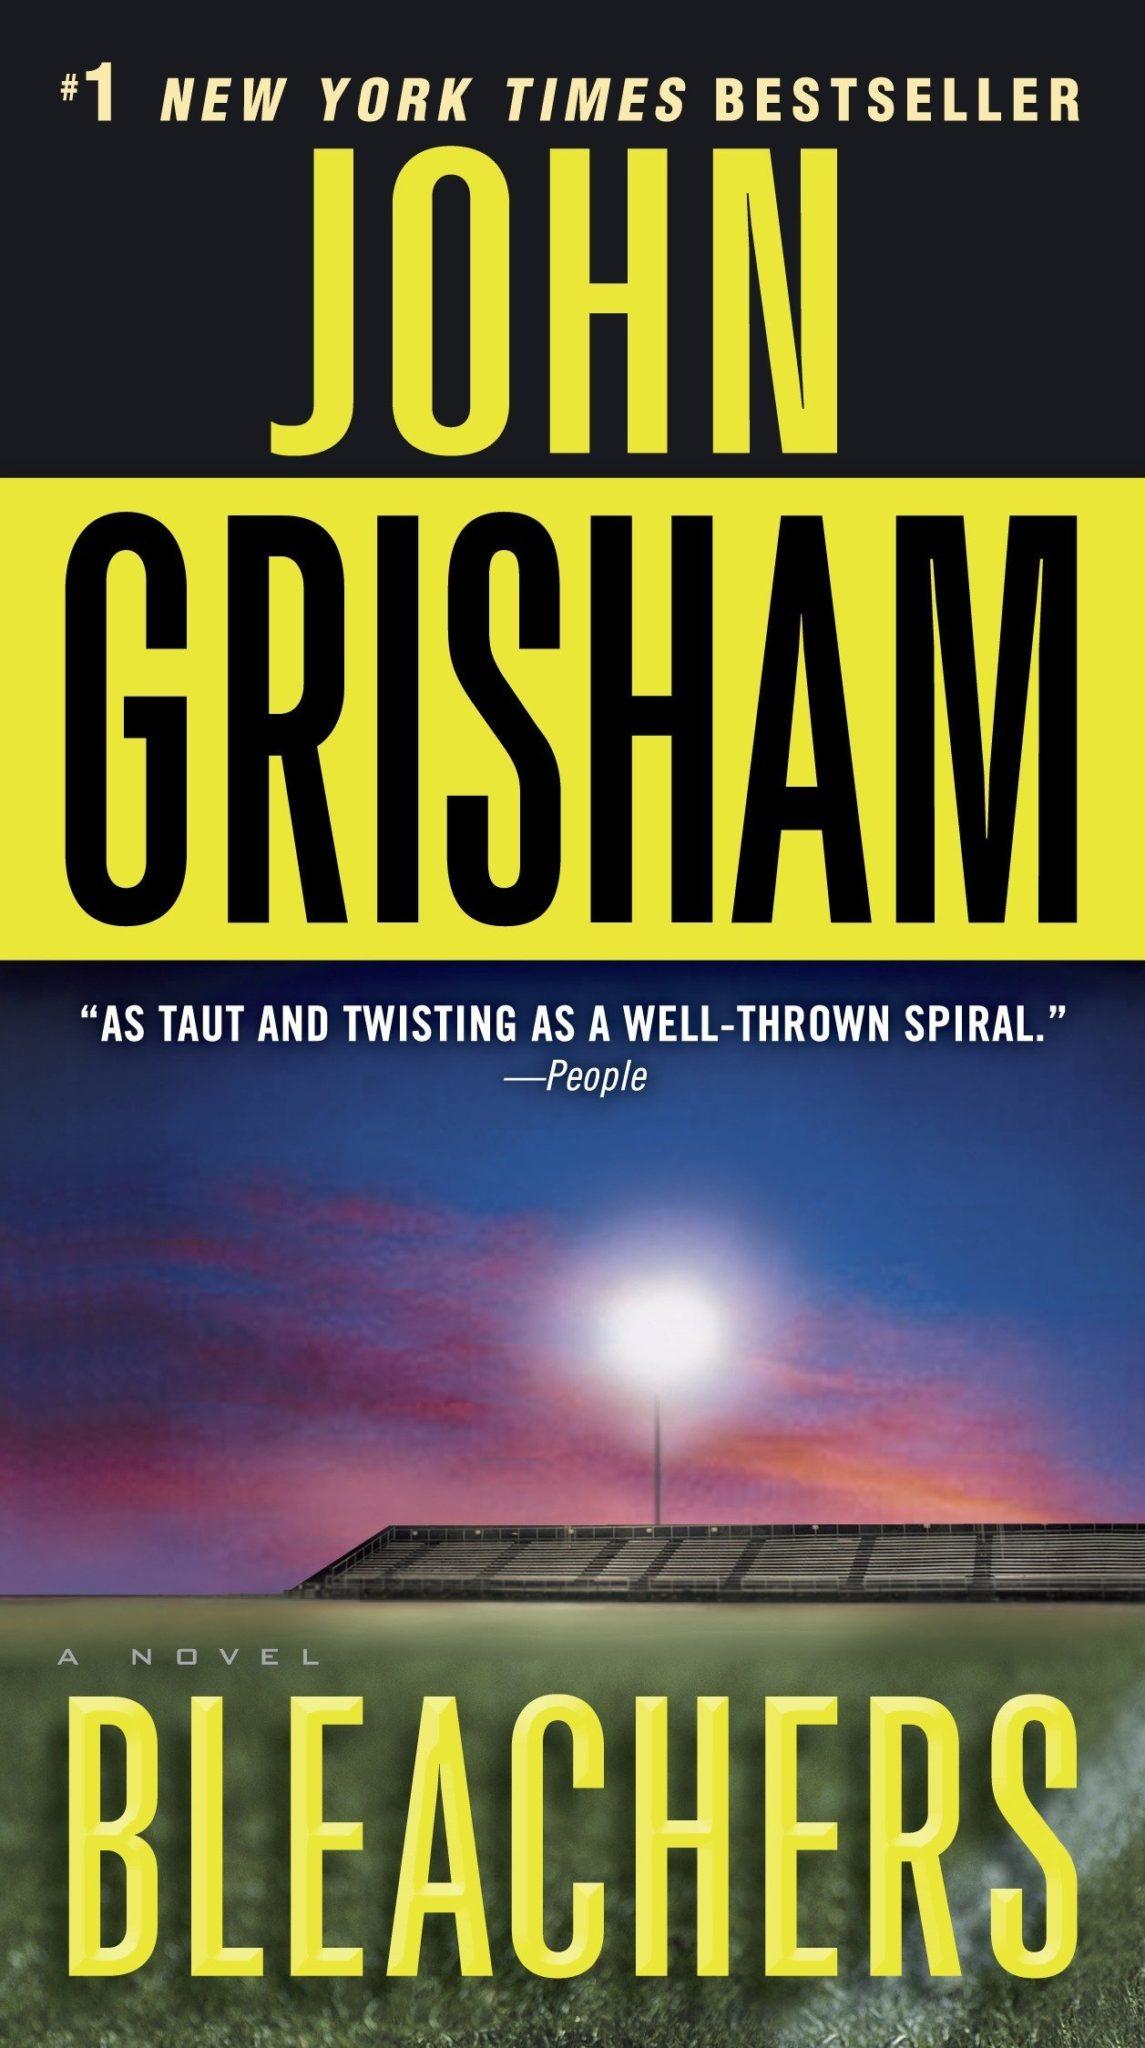 John Grisham books 18